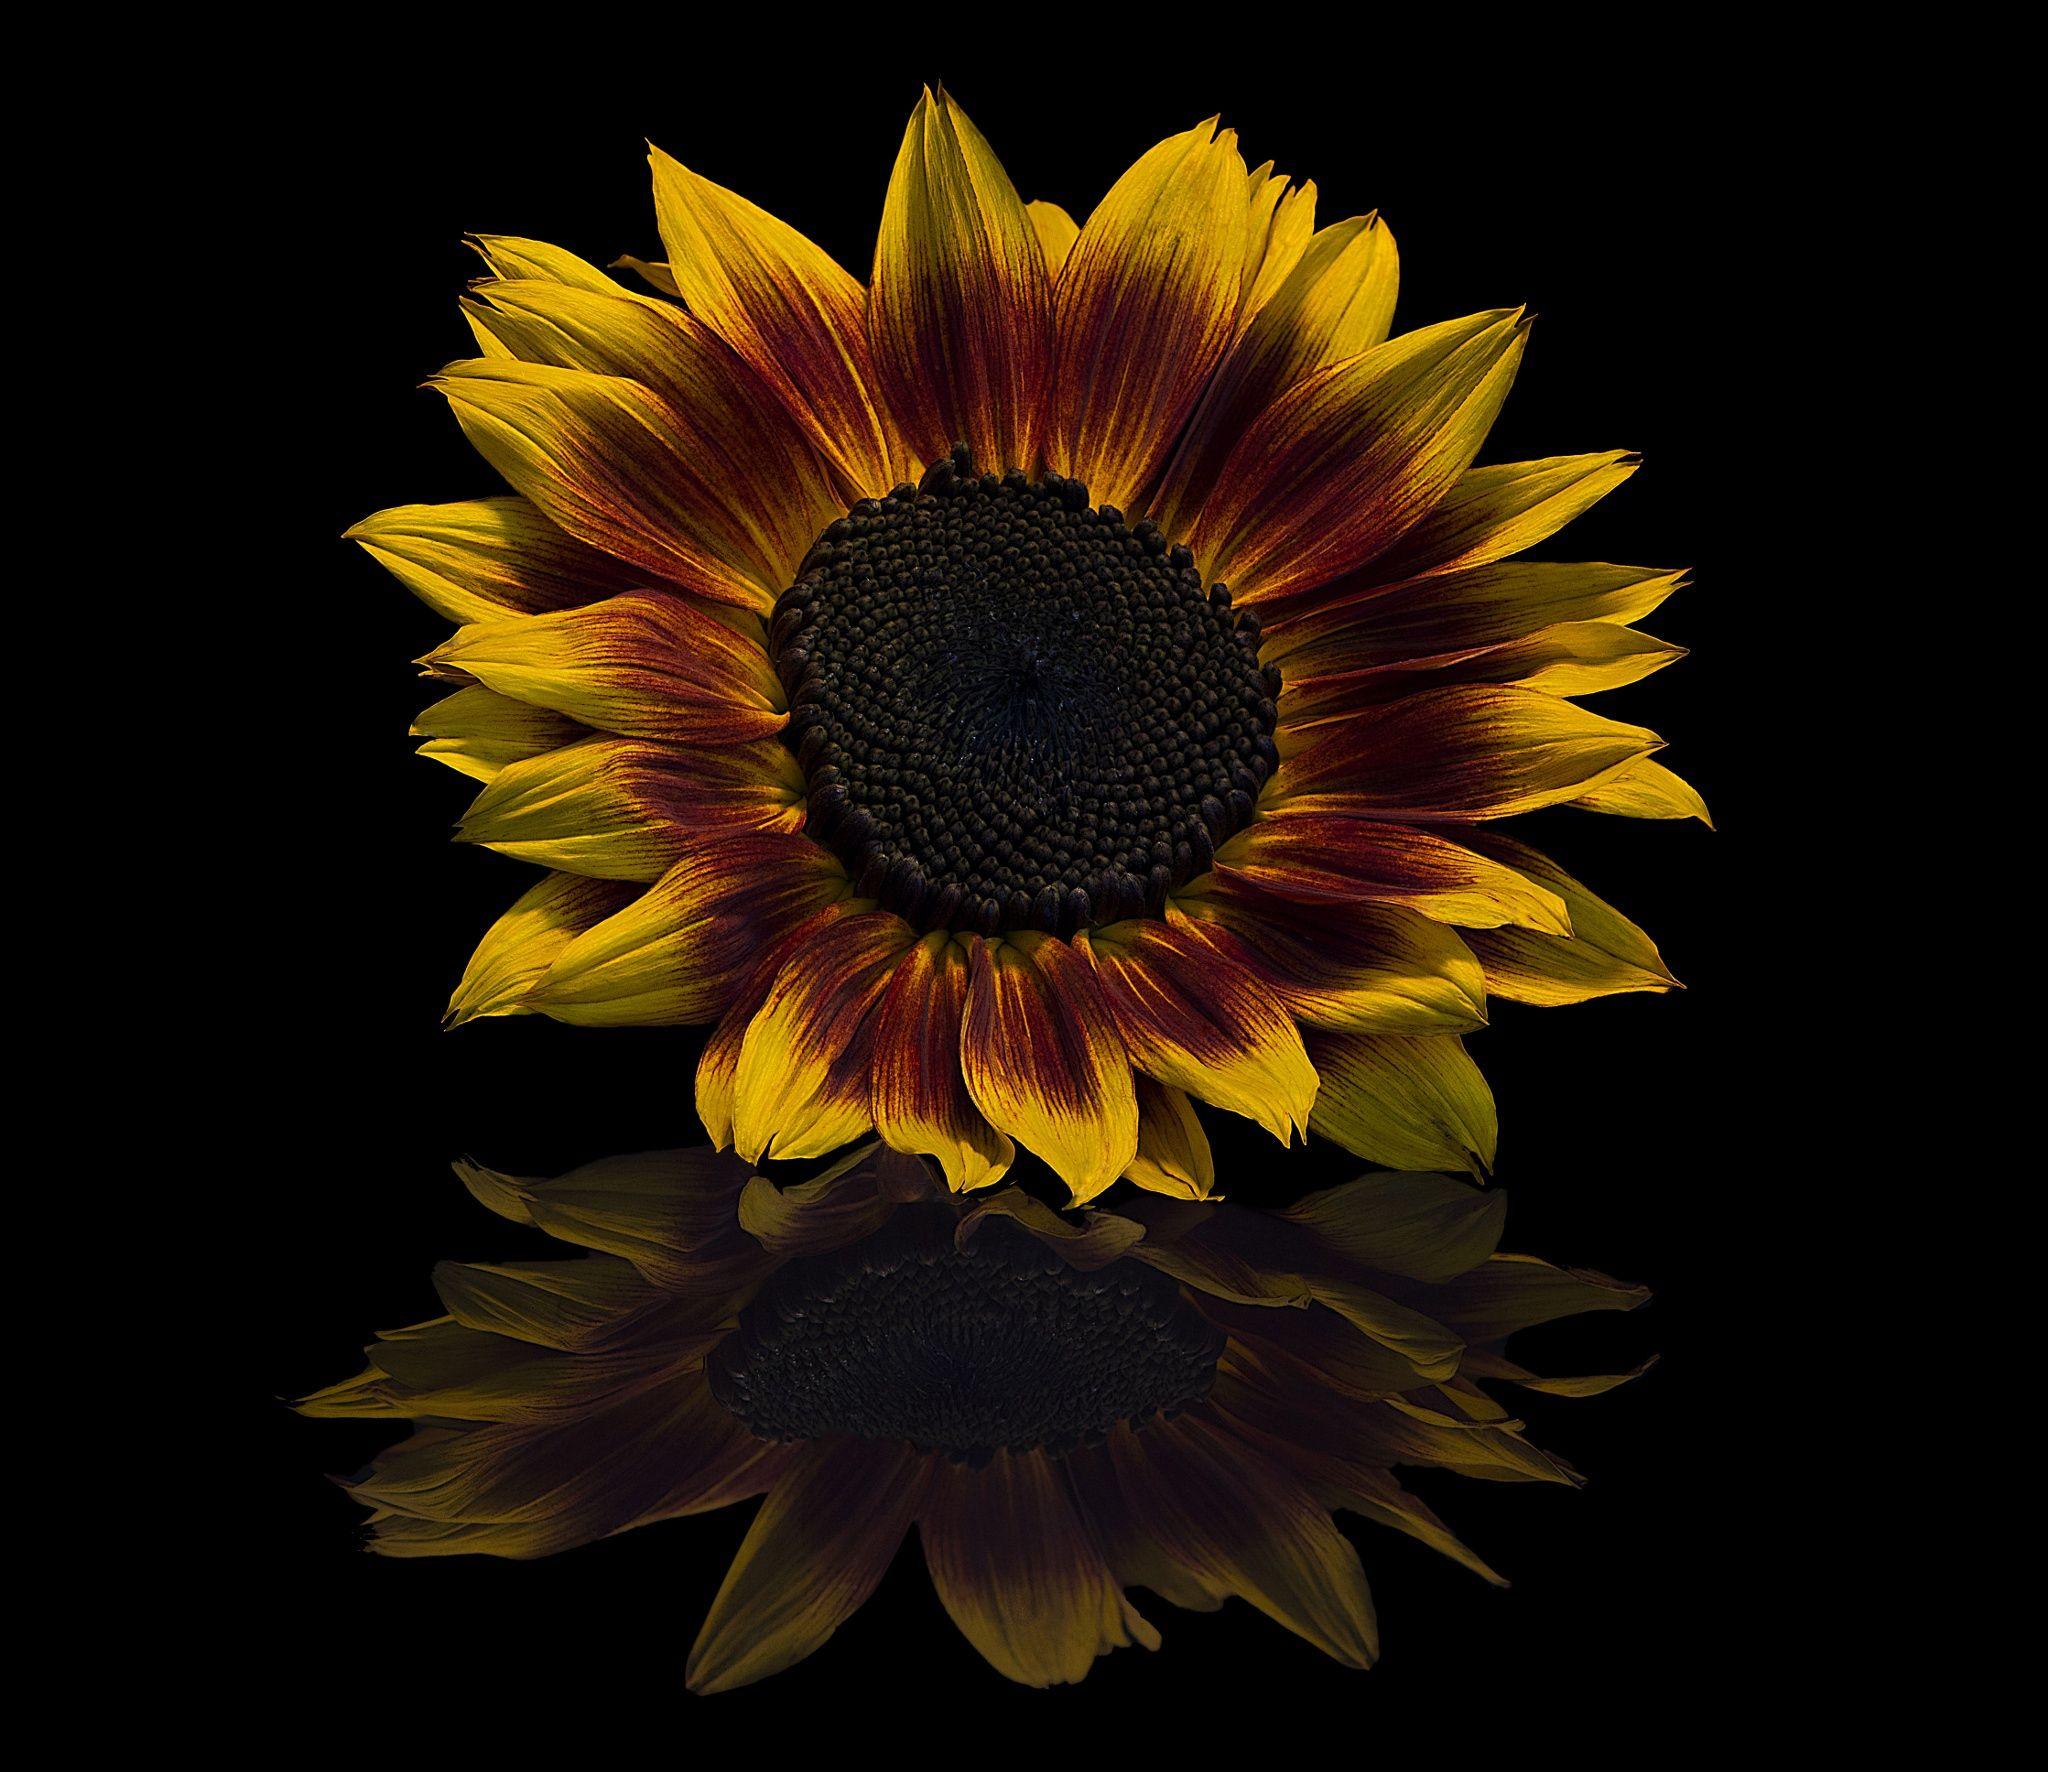 Sunflower Bicolor Sunflower Sunflower Photography Flowers